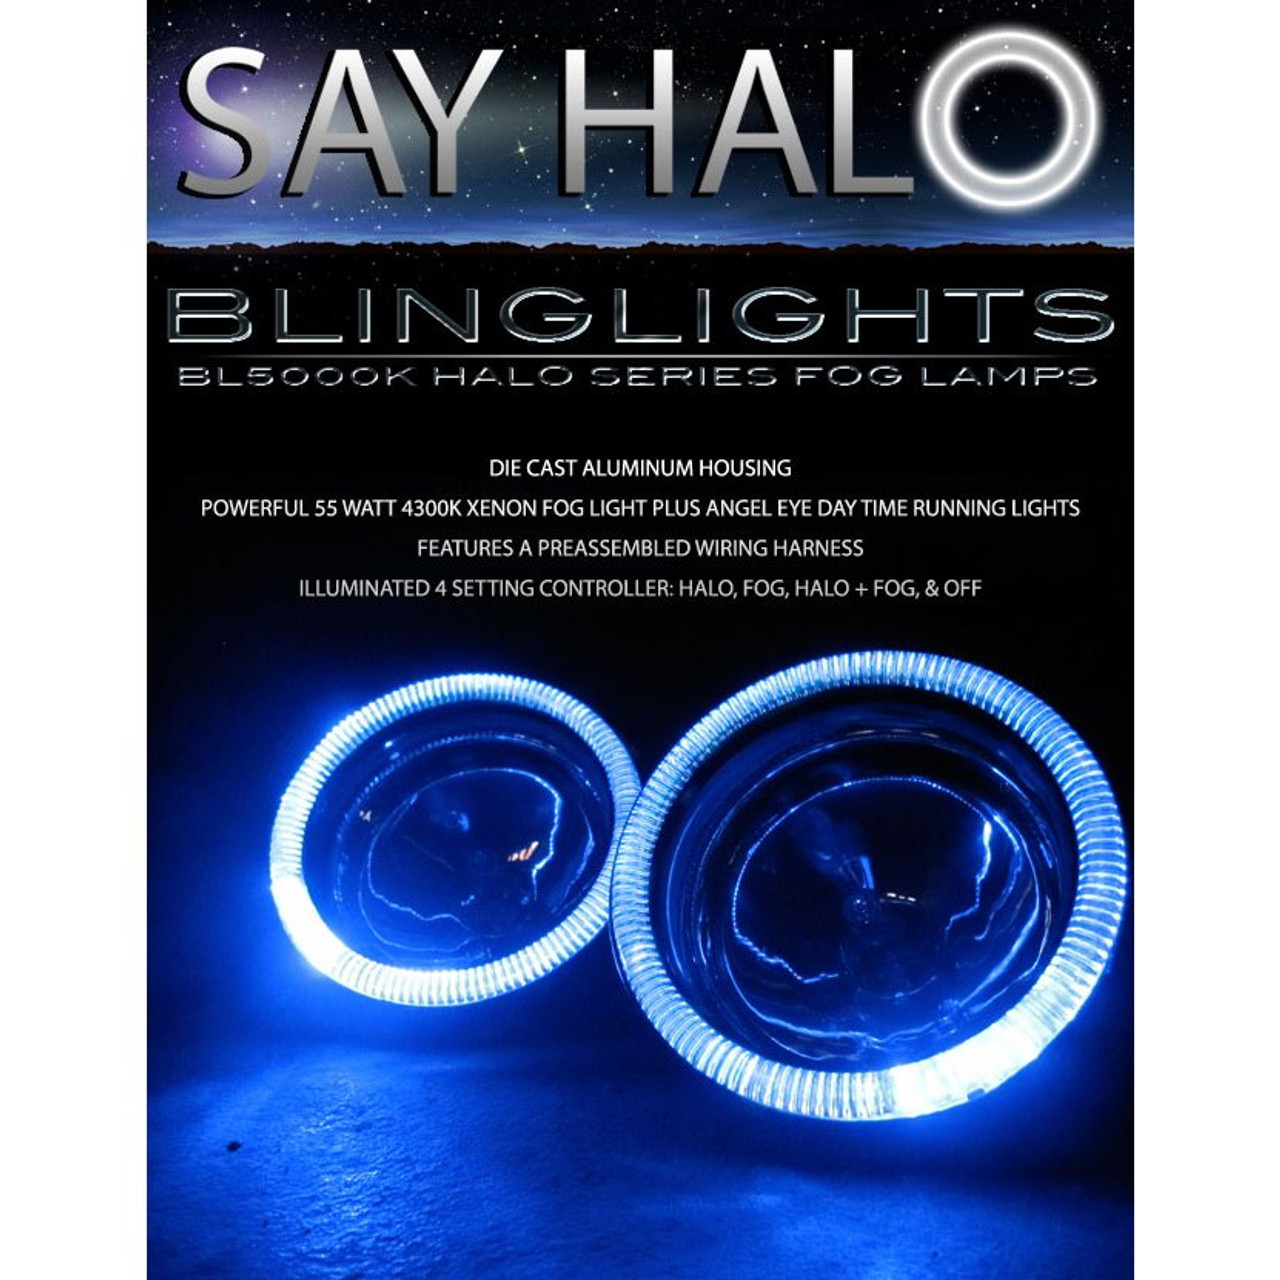 2002 2003 2004 2005 2006 Mitsubishi Pajero Halo Foglamps Angel Eye Fog Lamps Driving Lights Kit